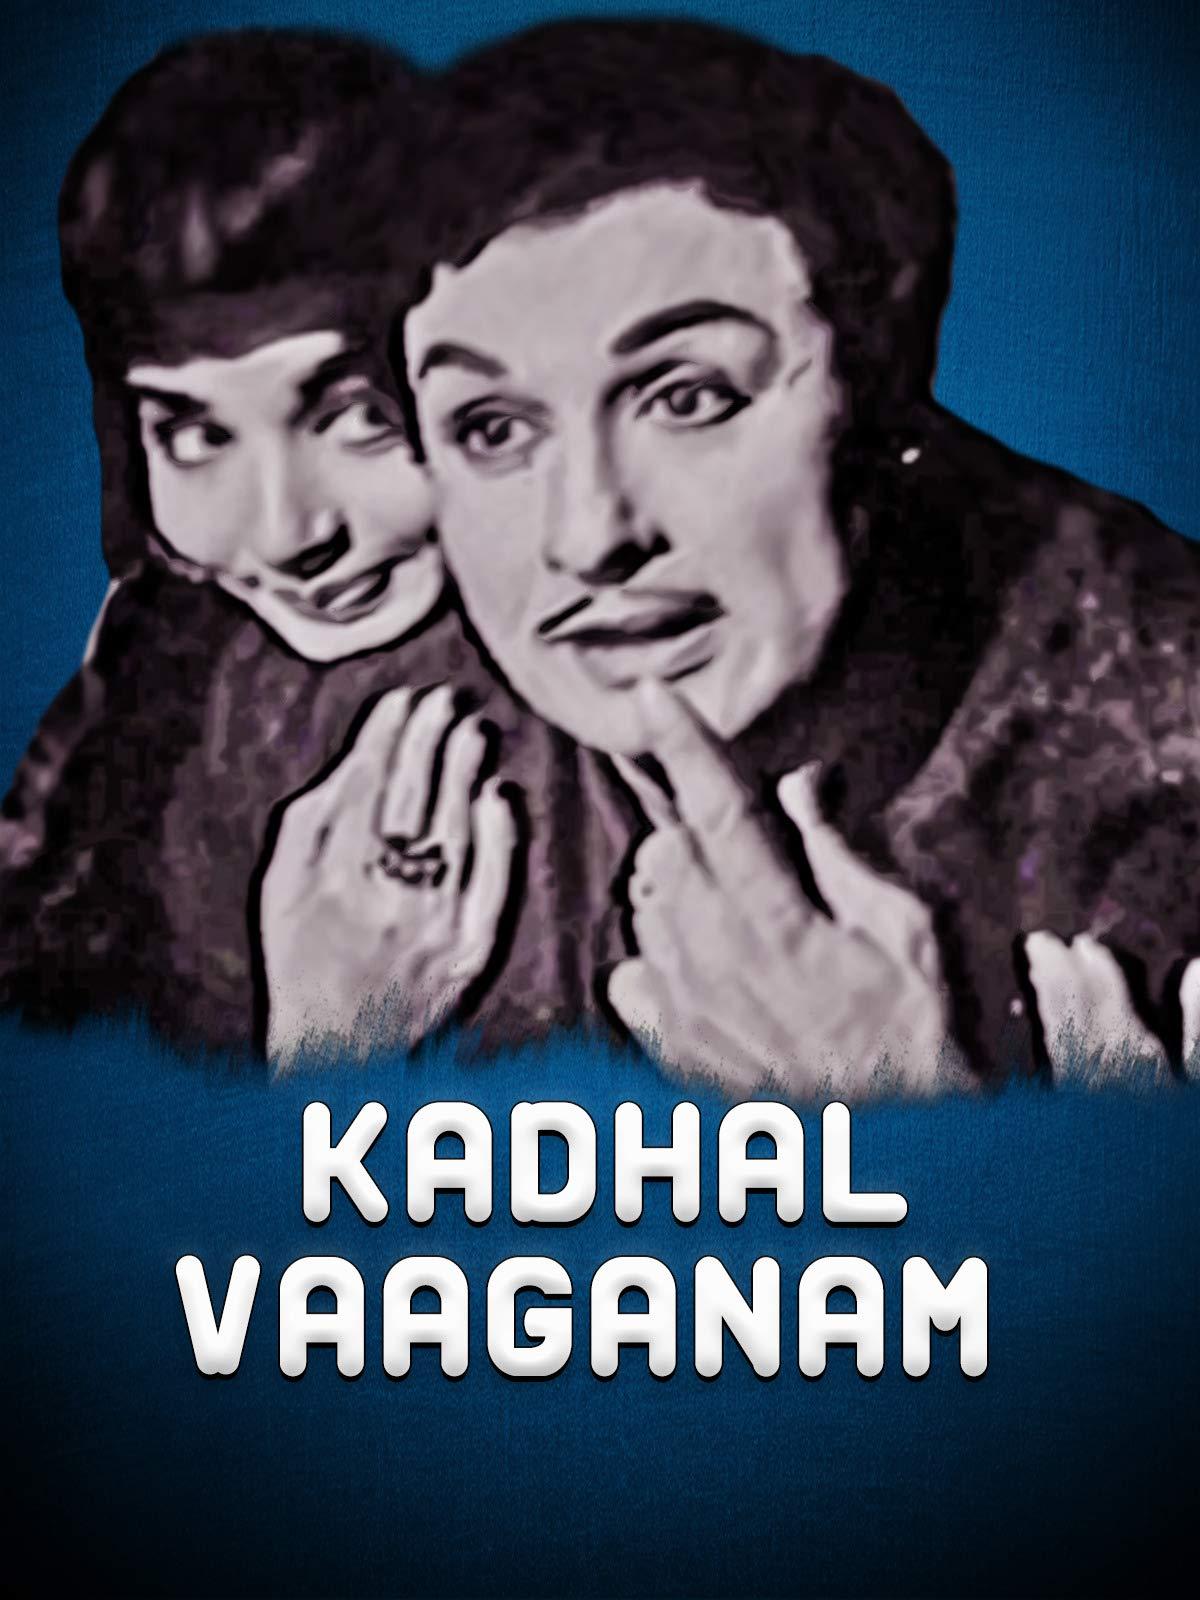 Kadhal Vaaganam